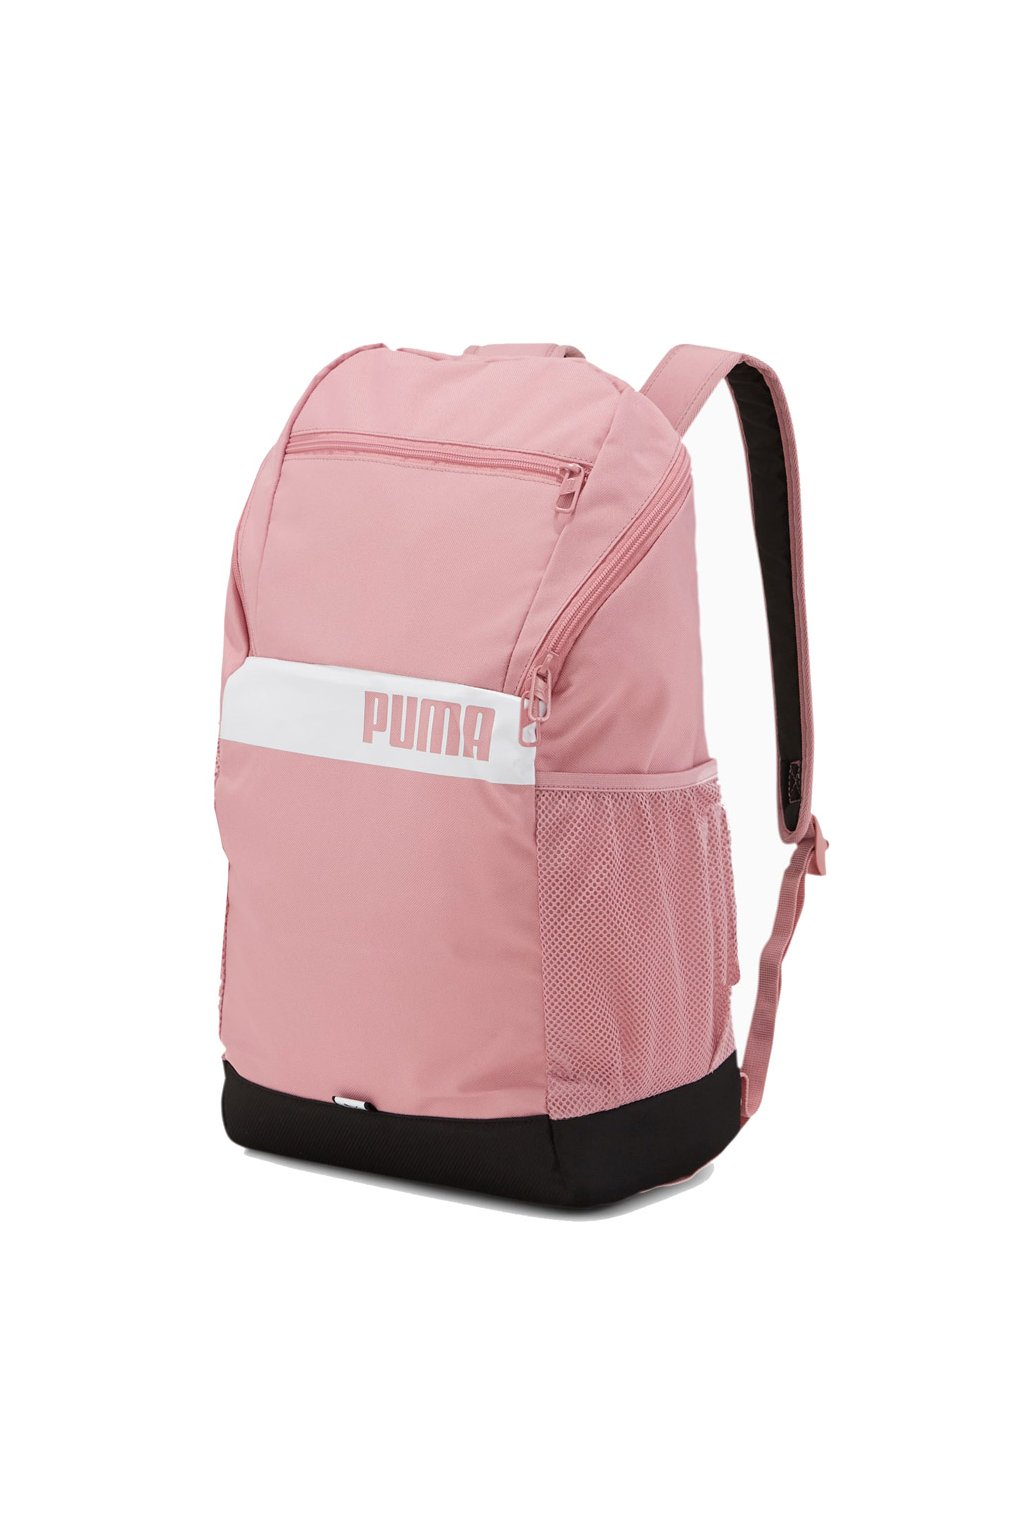 Batoh Puma Plus Backpack ružový 077292 05